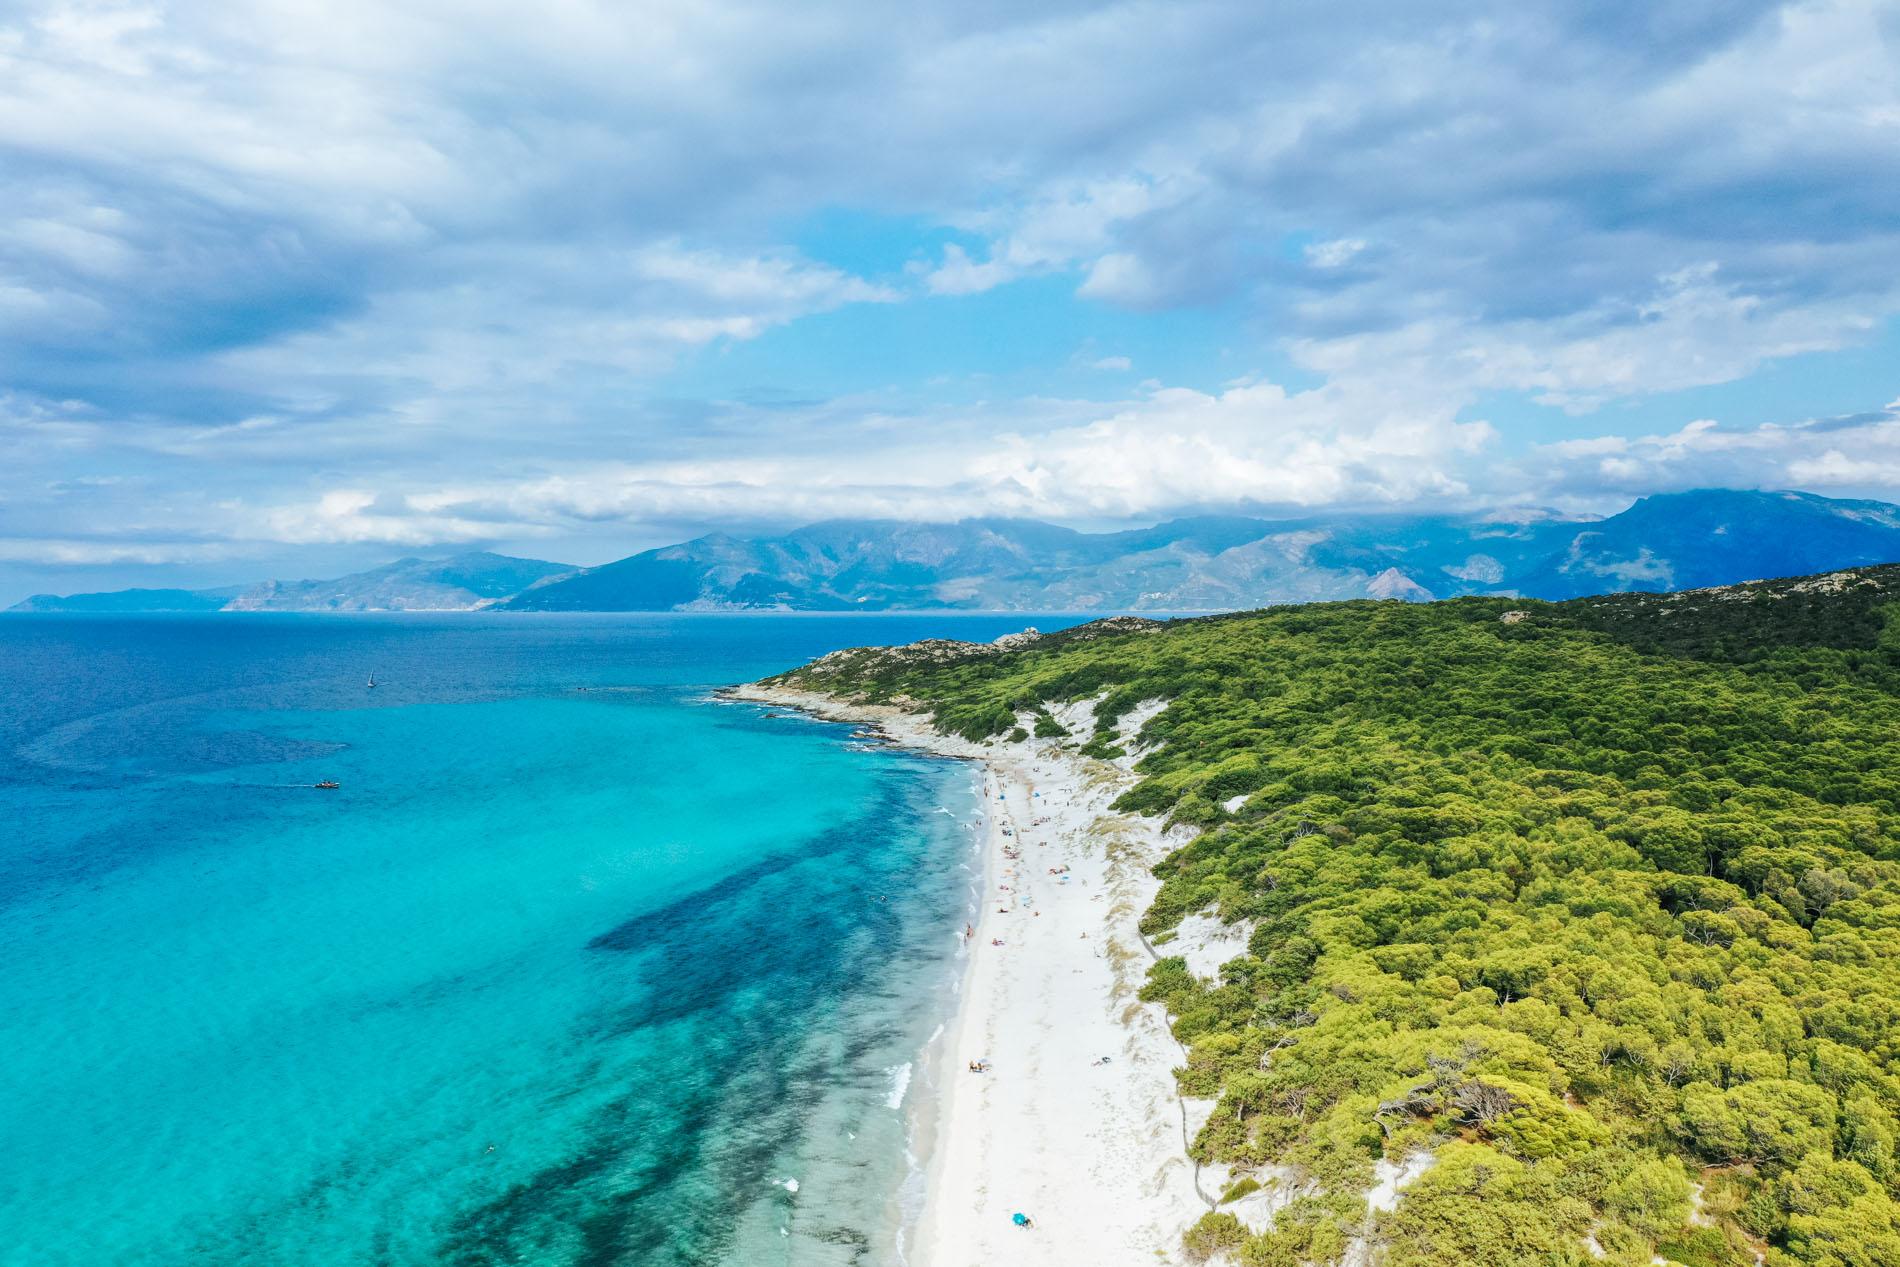 Plage de Saleccia en Corse